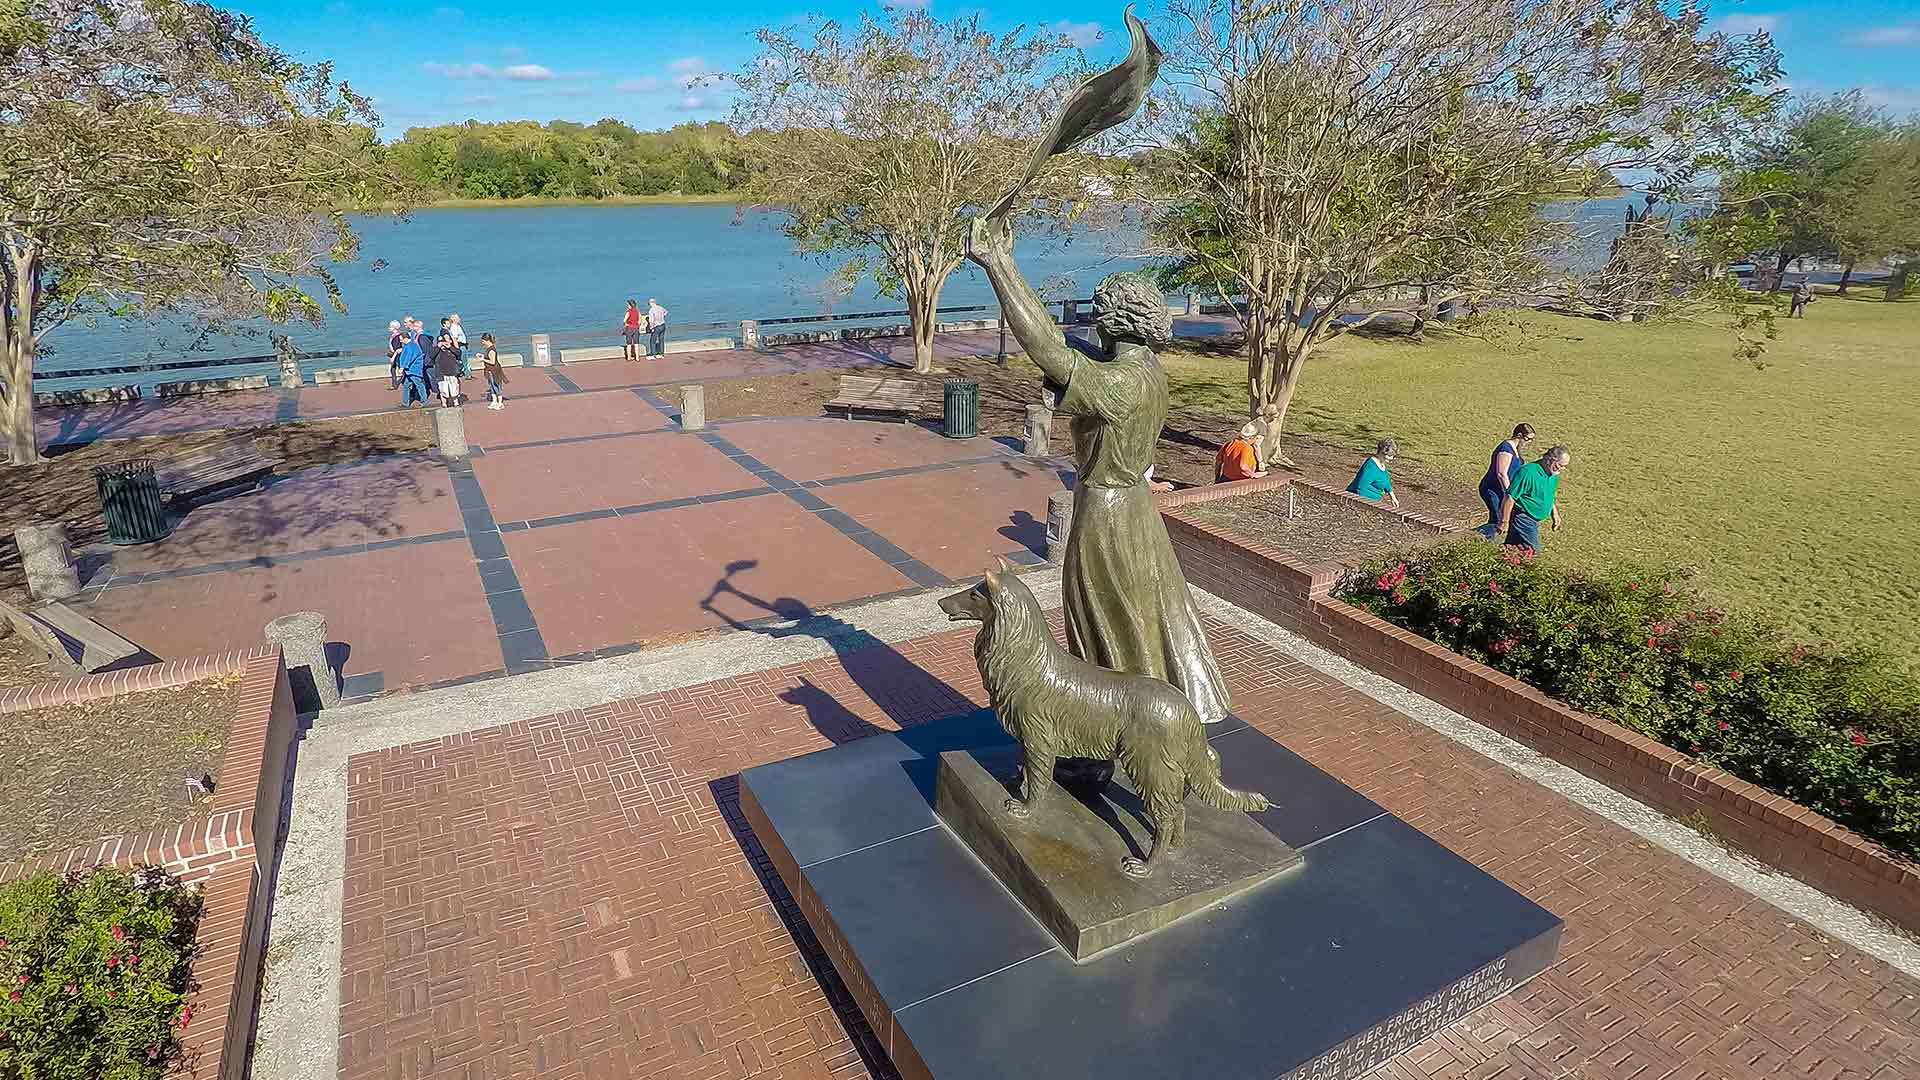 savannah waving girl statue